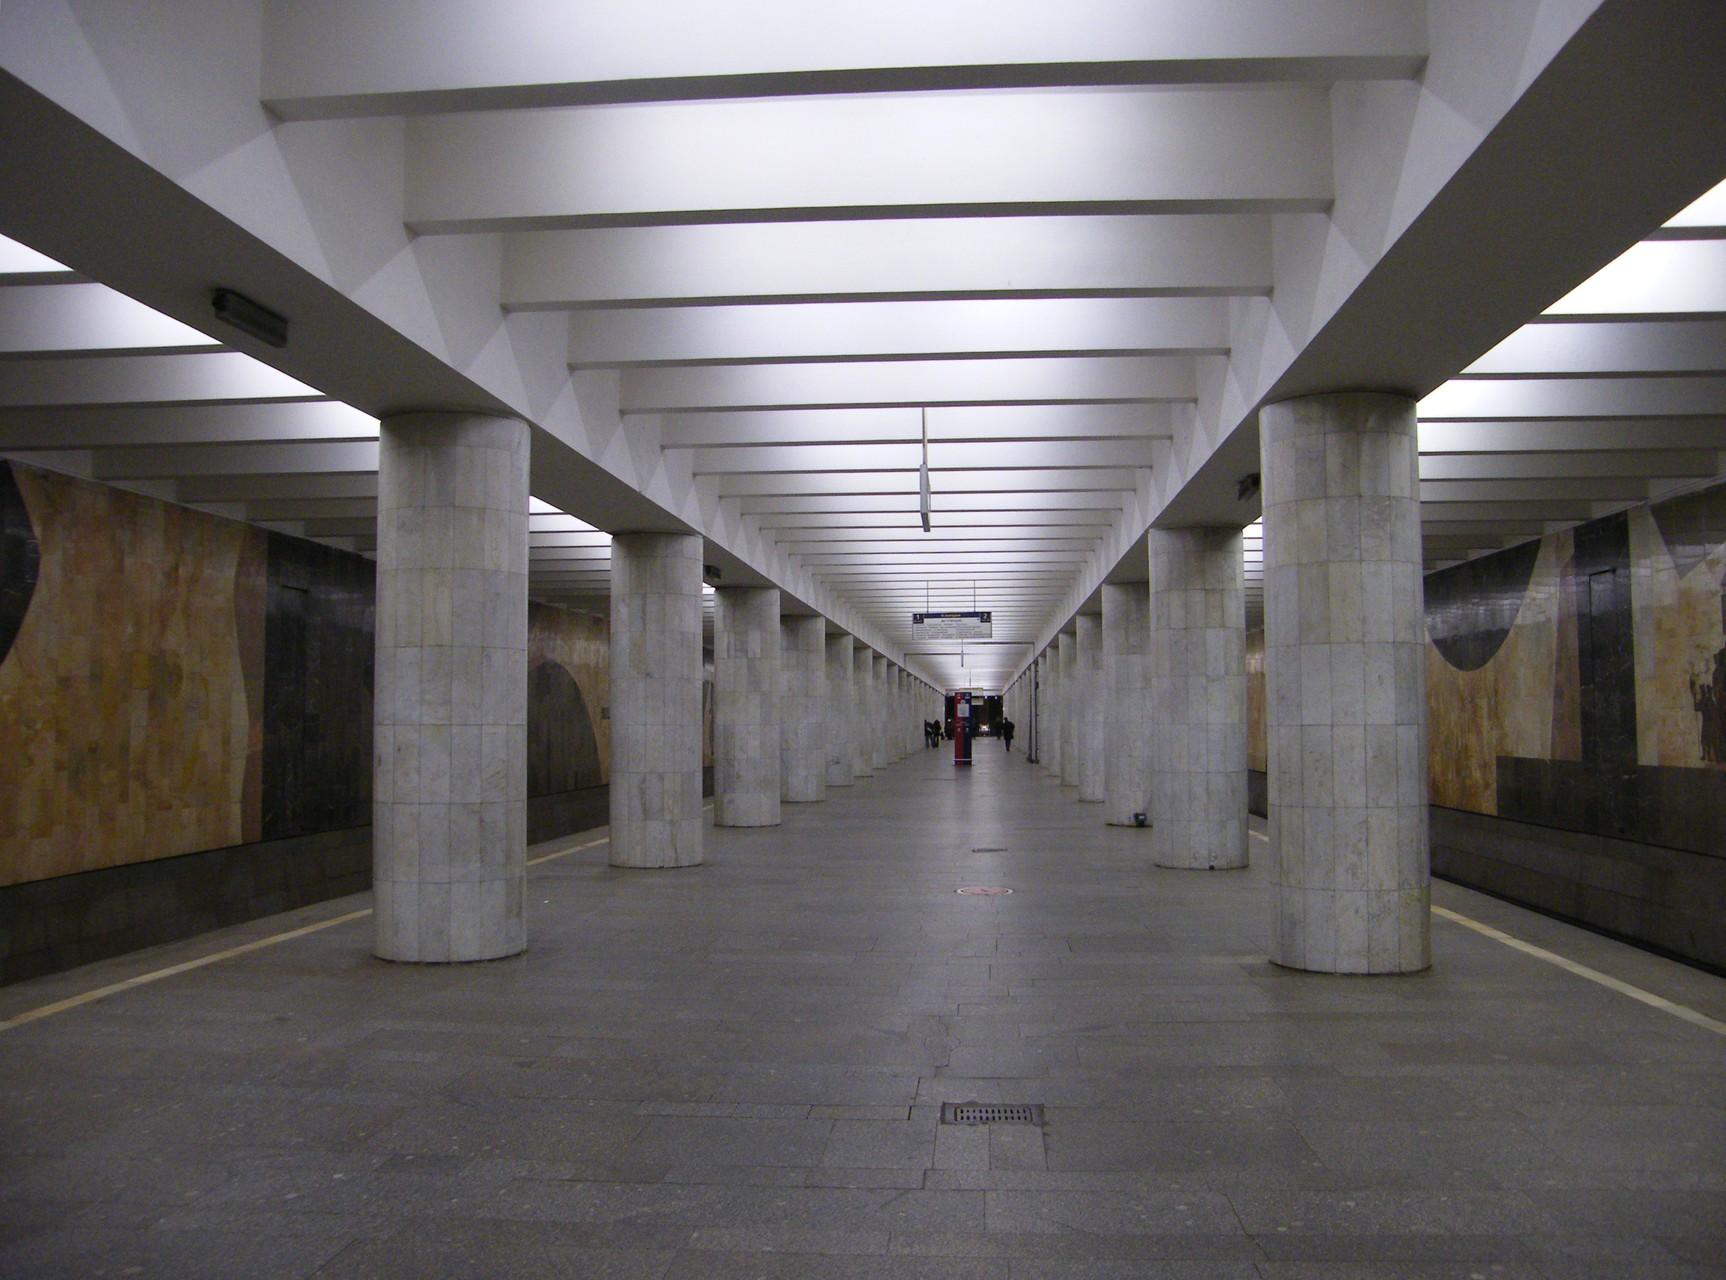 бетон нагатинская